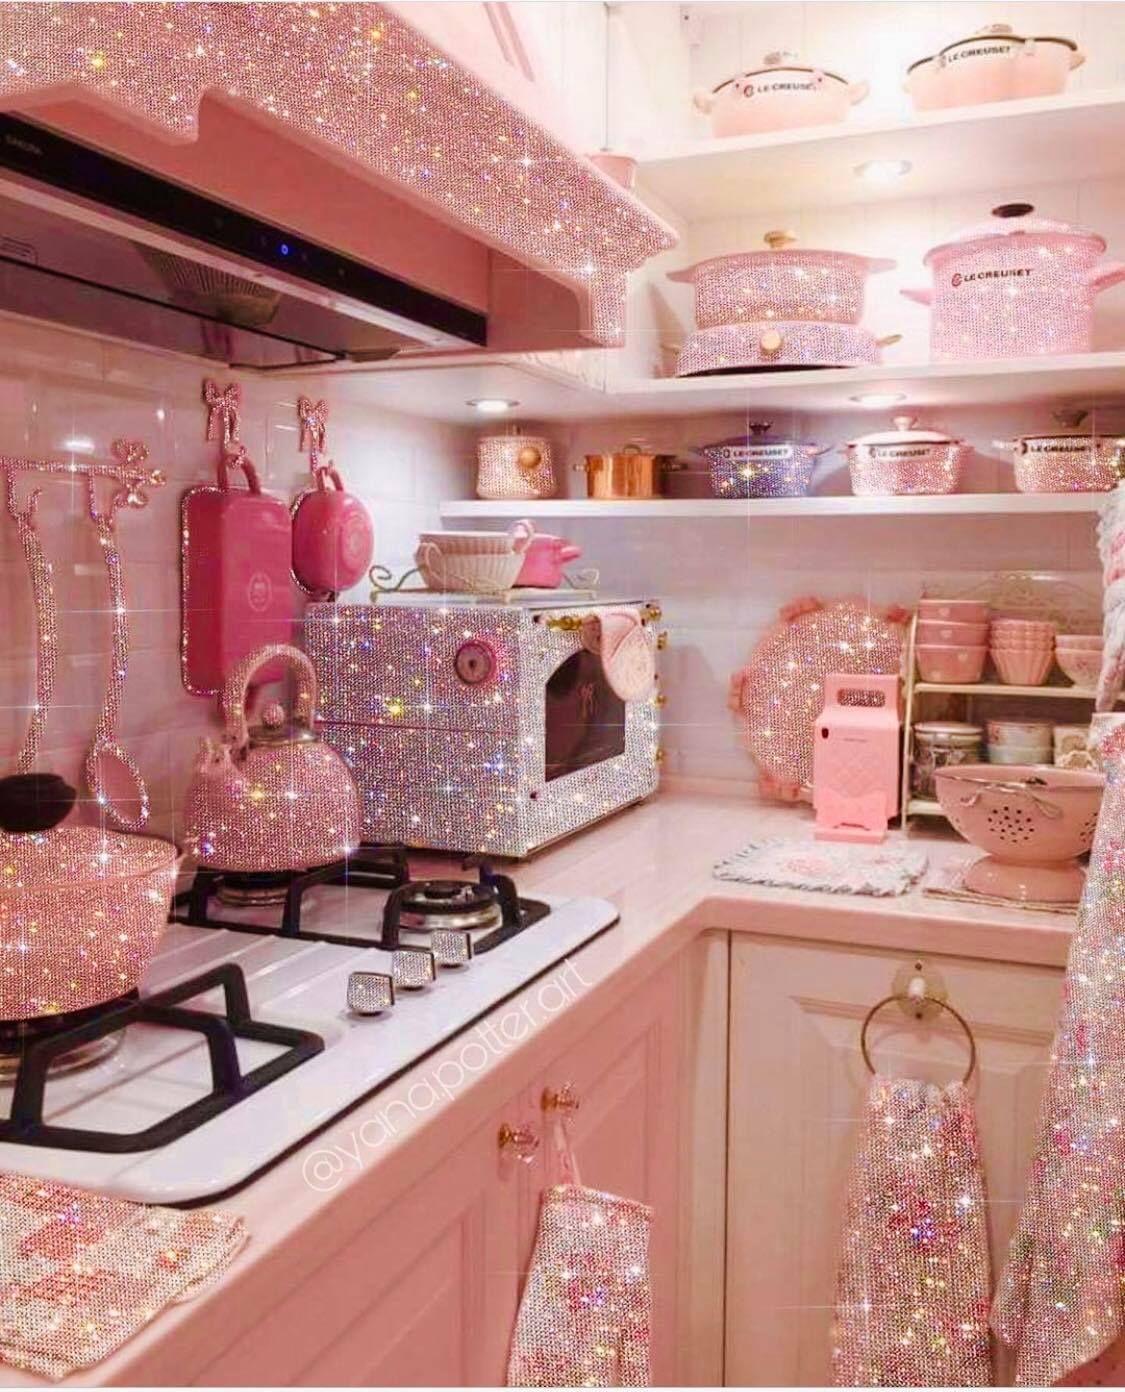 pink princess kitchen in 2020 on kitchen decor pink id=87255